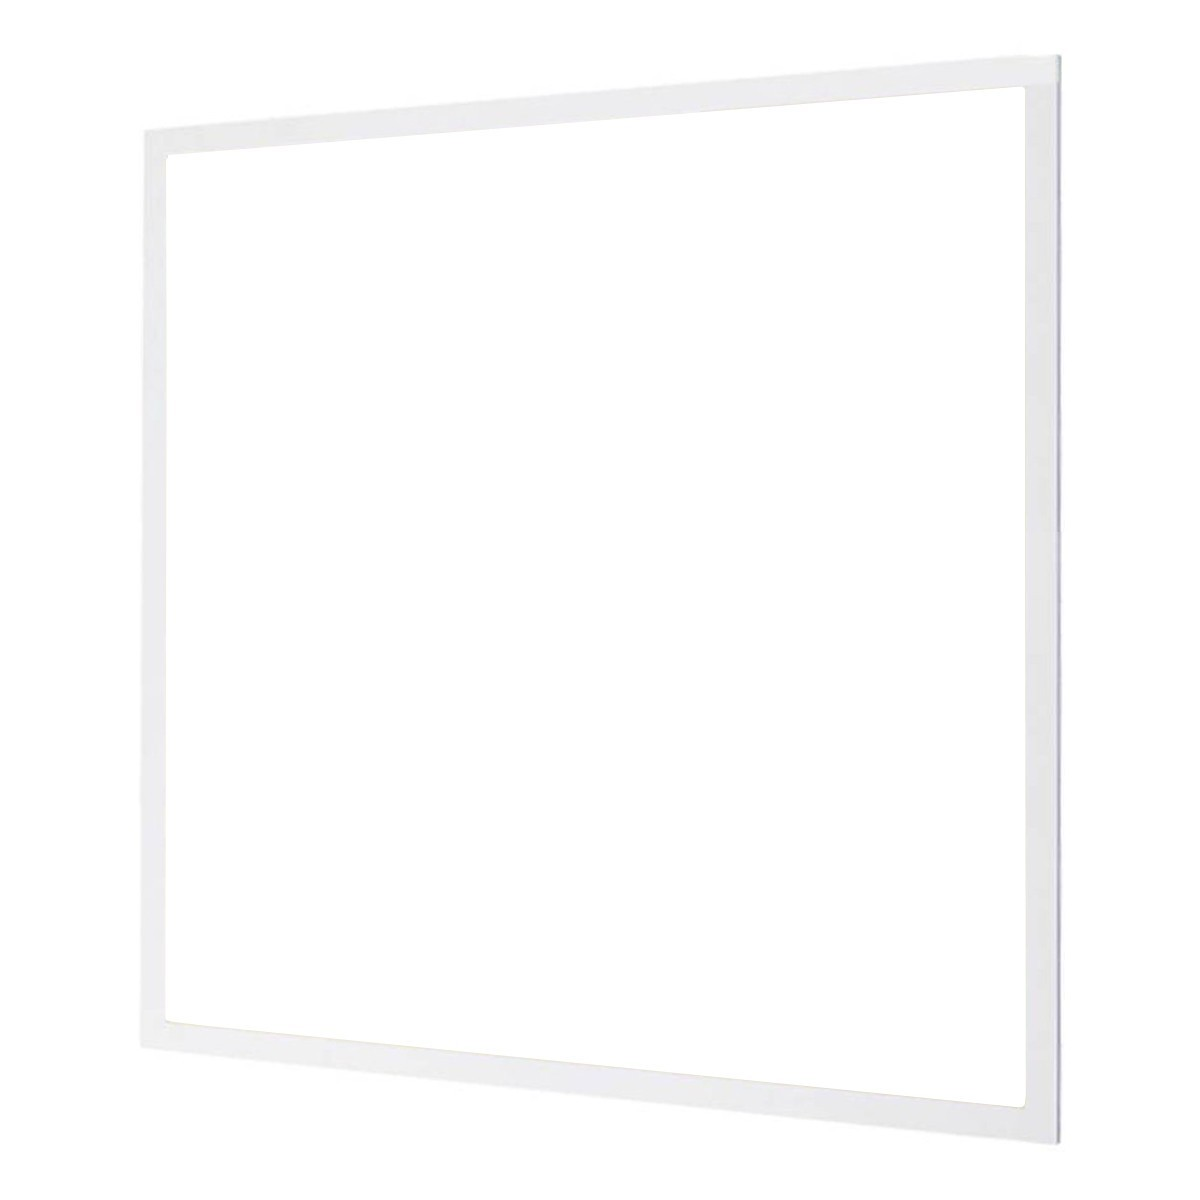 LED Paneel - Aigi - 60x60 Helder/Koud Wit 6000K - 40W High Lumen UGR19 - Inbouw Vierkant - Inclusief